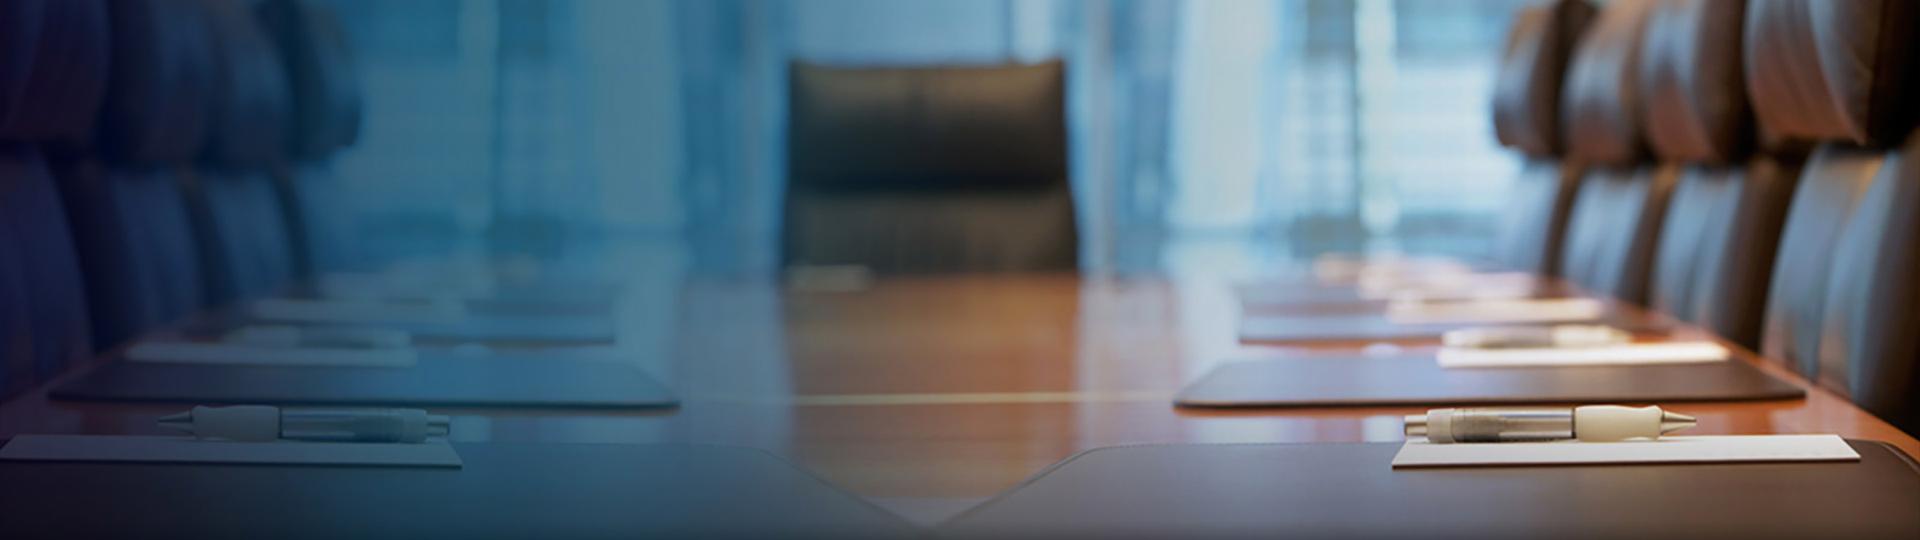 Nonprofit Executive Search Benefits of DHR